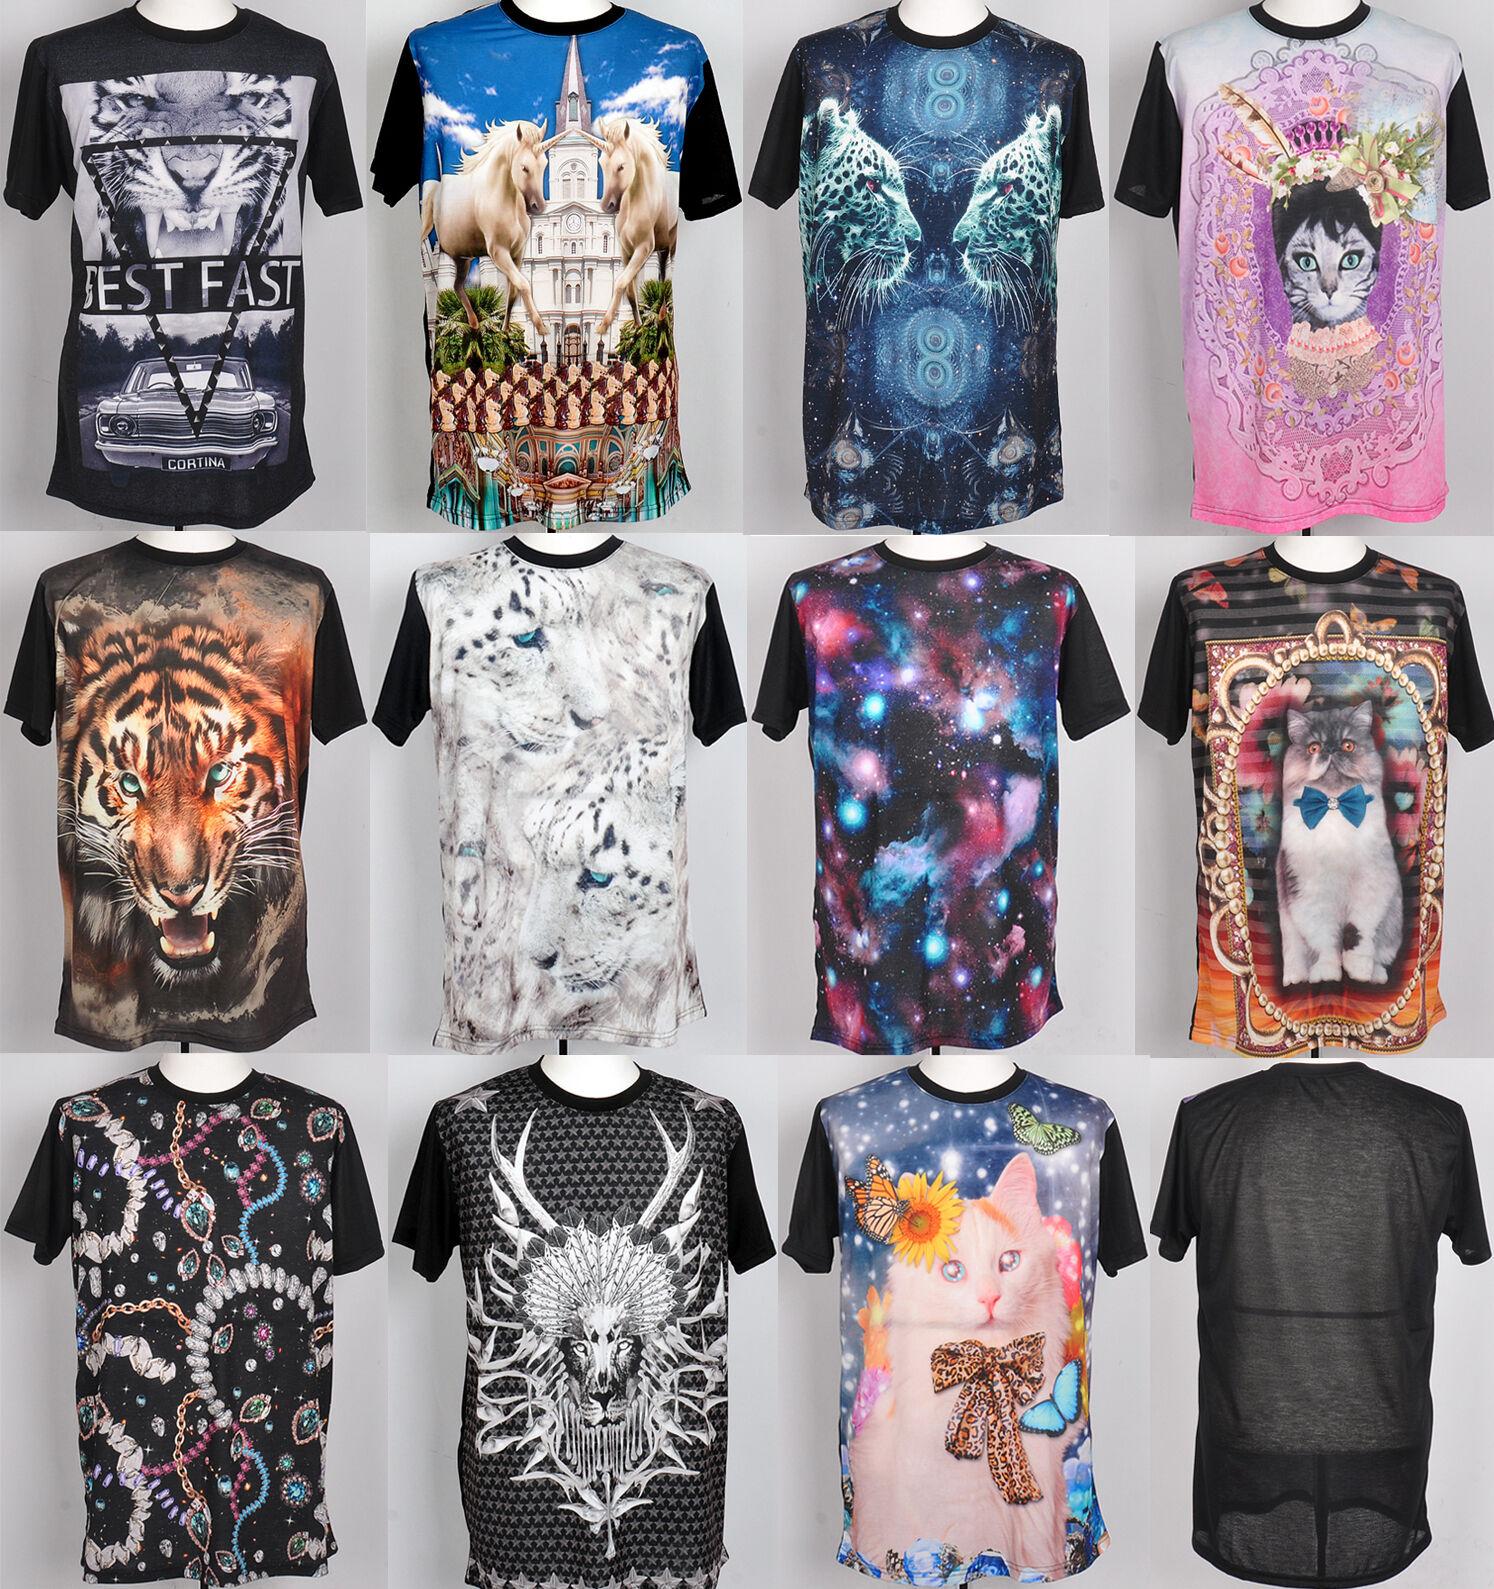 Unisex galaxy stellar cat printed short sleeve t-shirts round neck top tee sz M